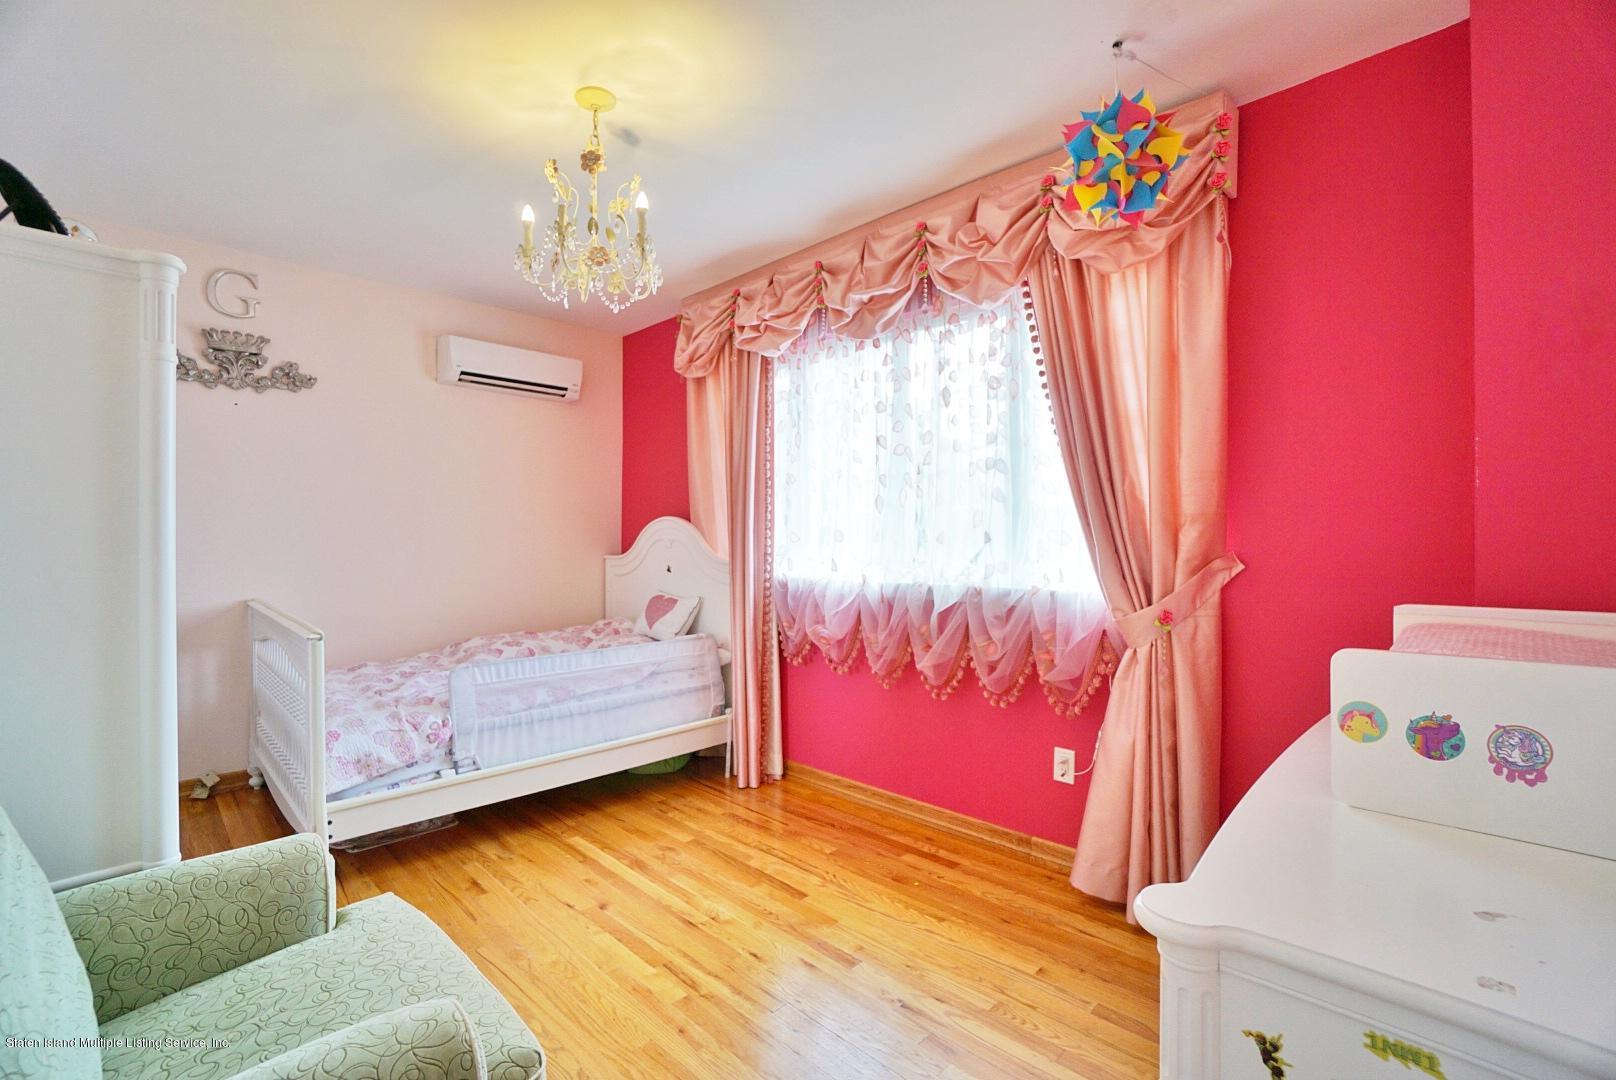 Single Family - Semi-Attached 36 Zwicky Avenue  Staten Island, NY 10306, MLS-1131911-20